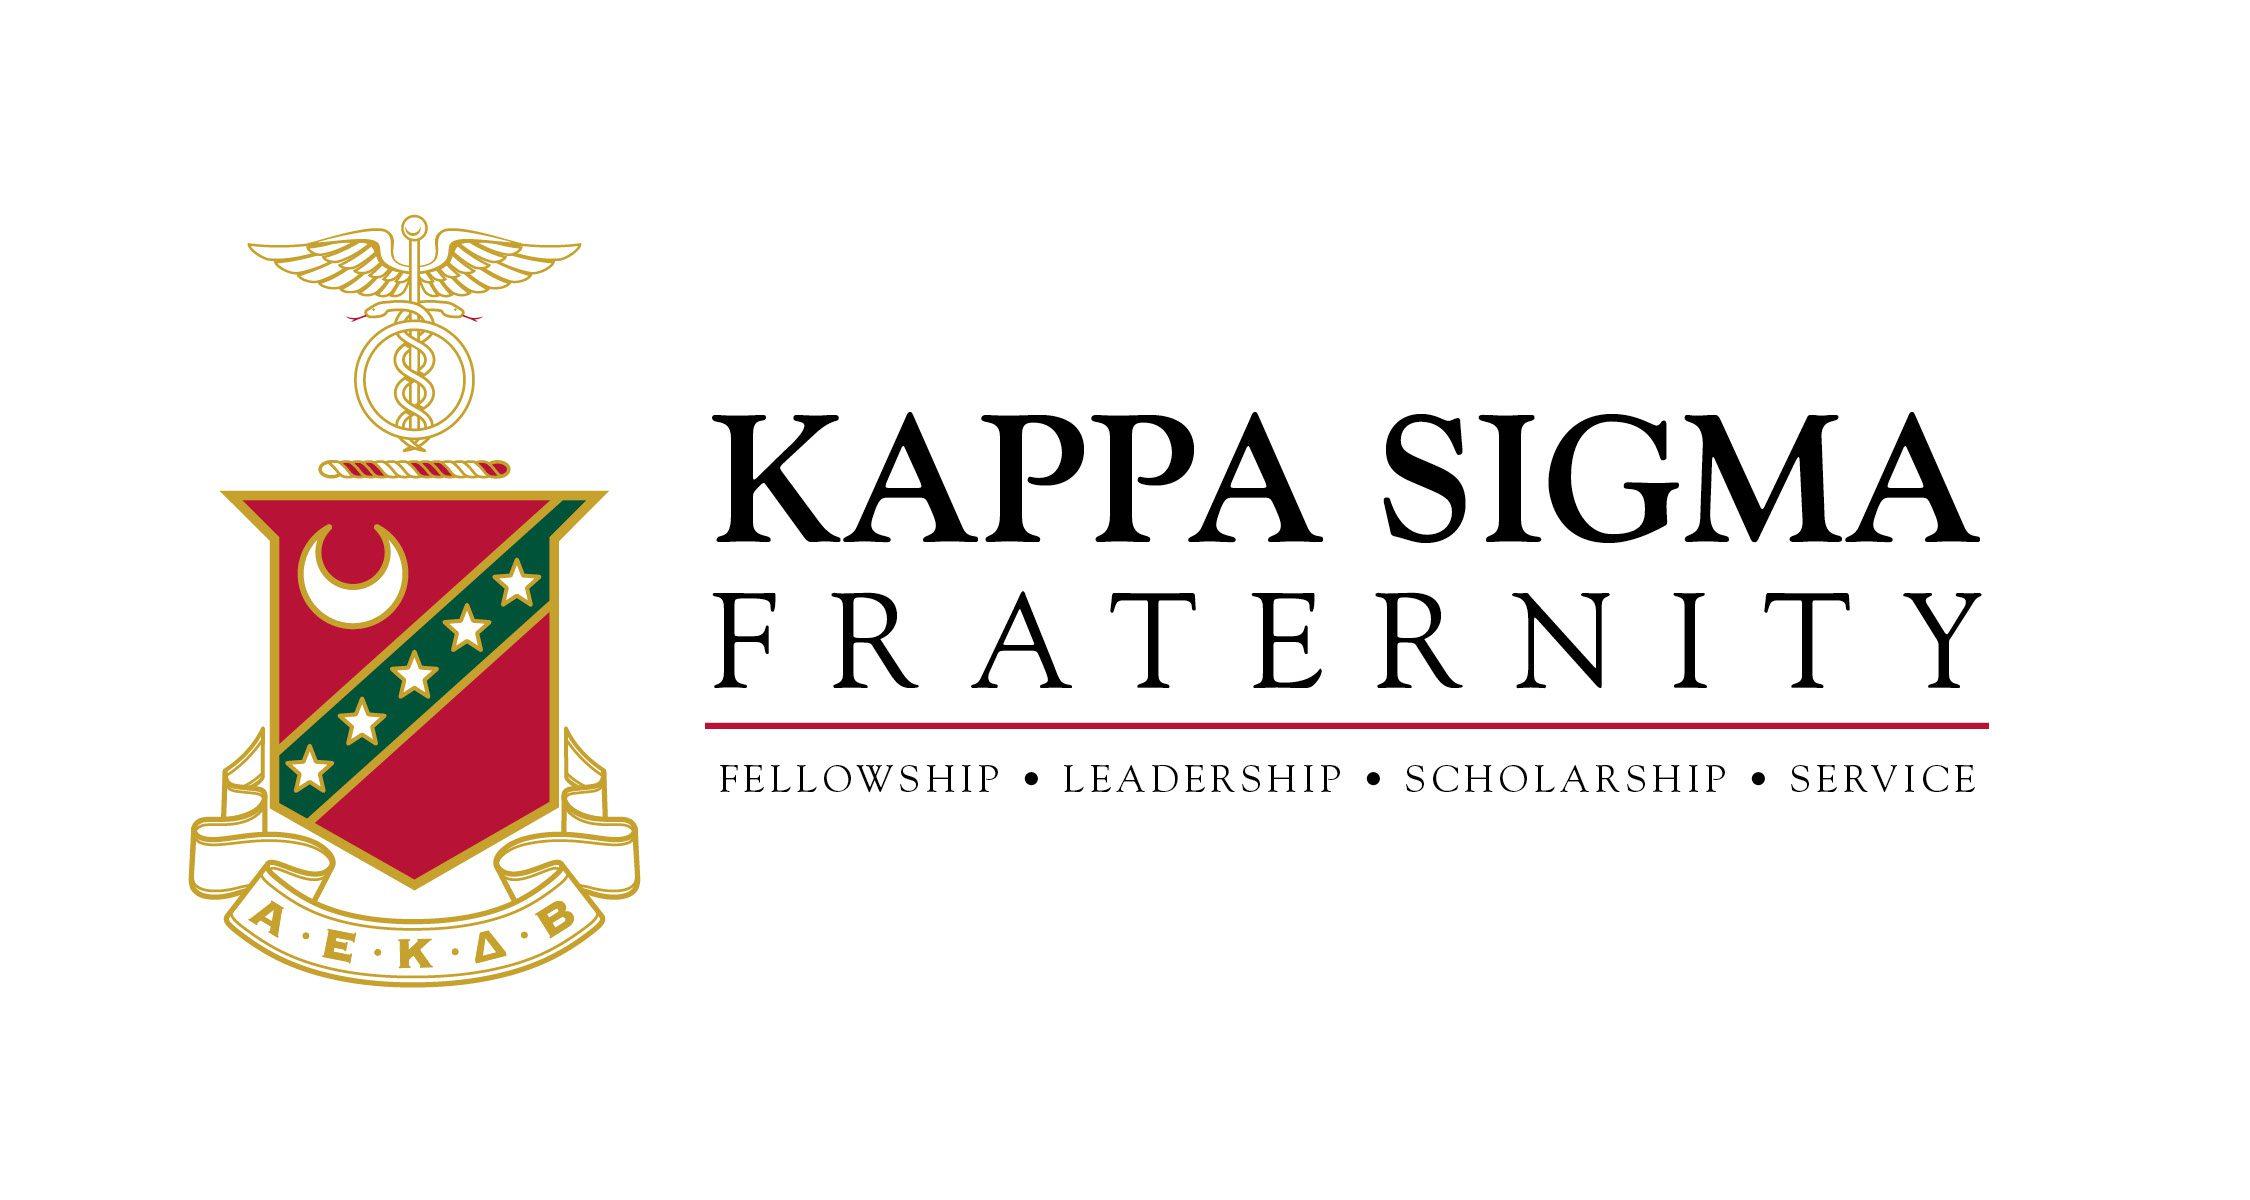 Umass Kappa Sigma